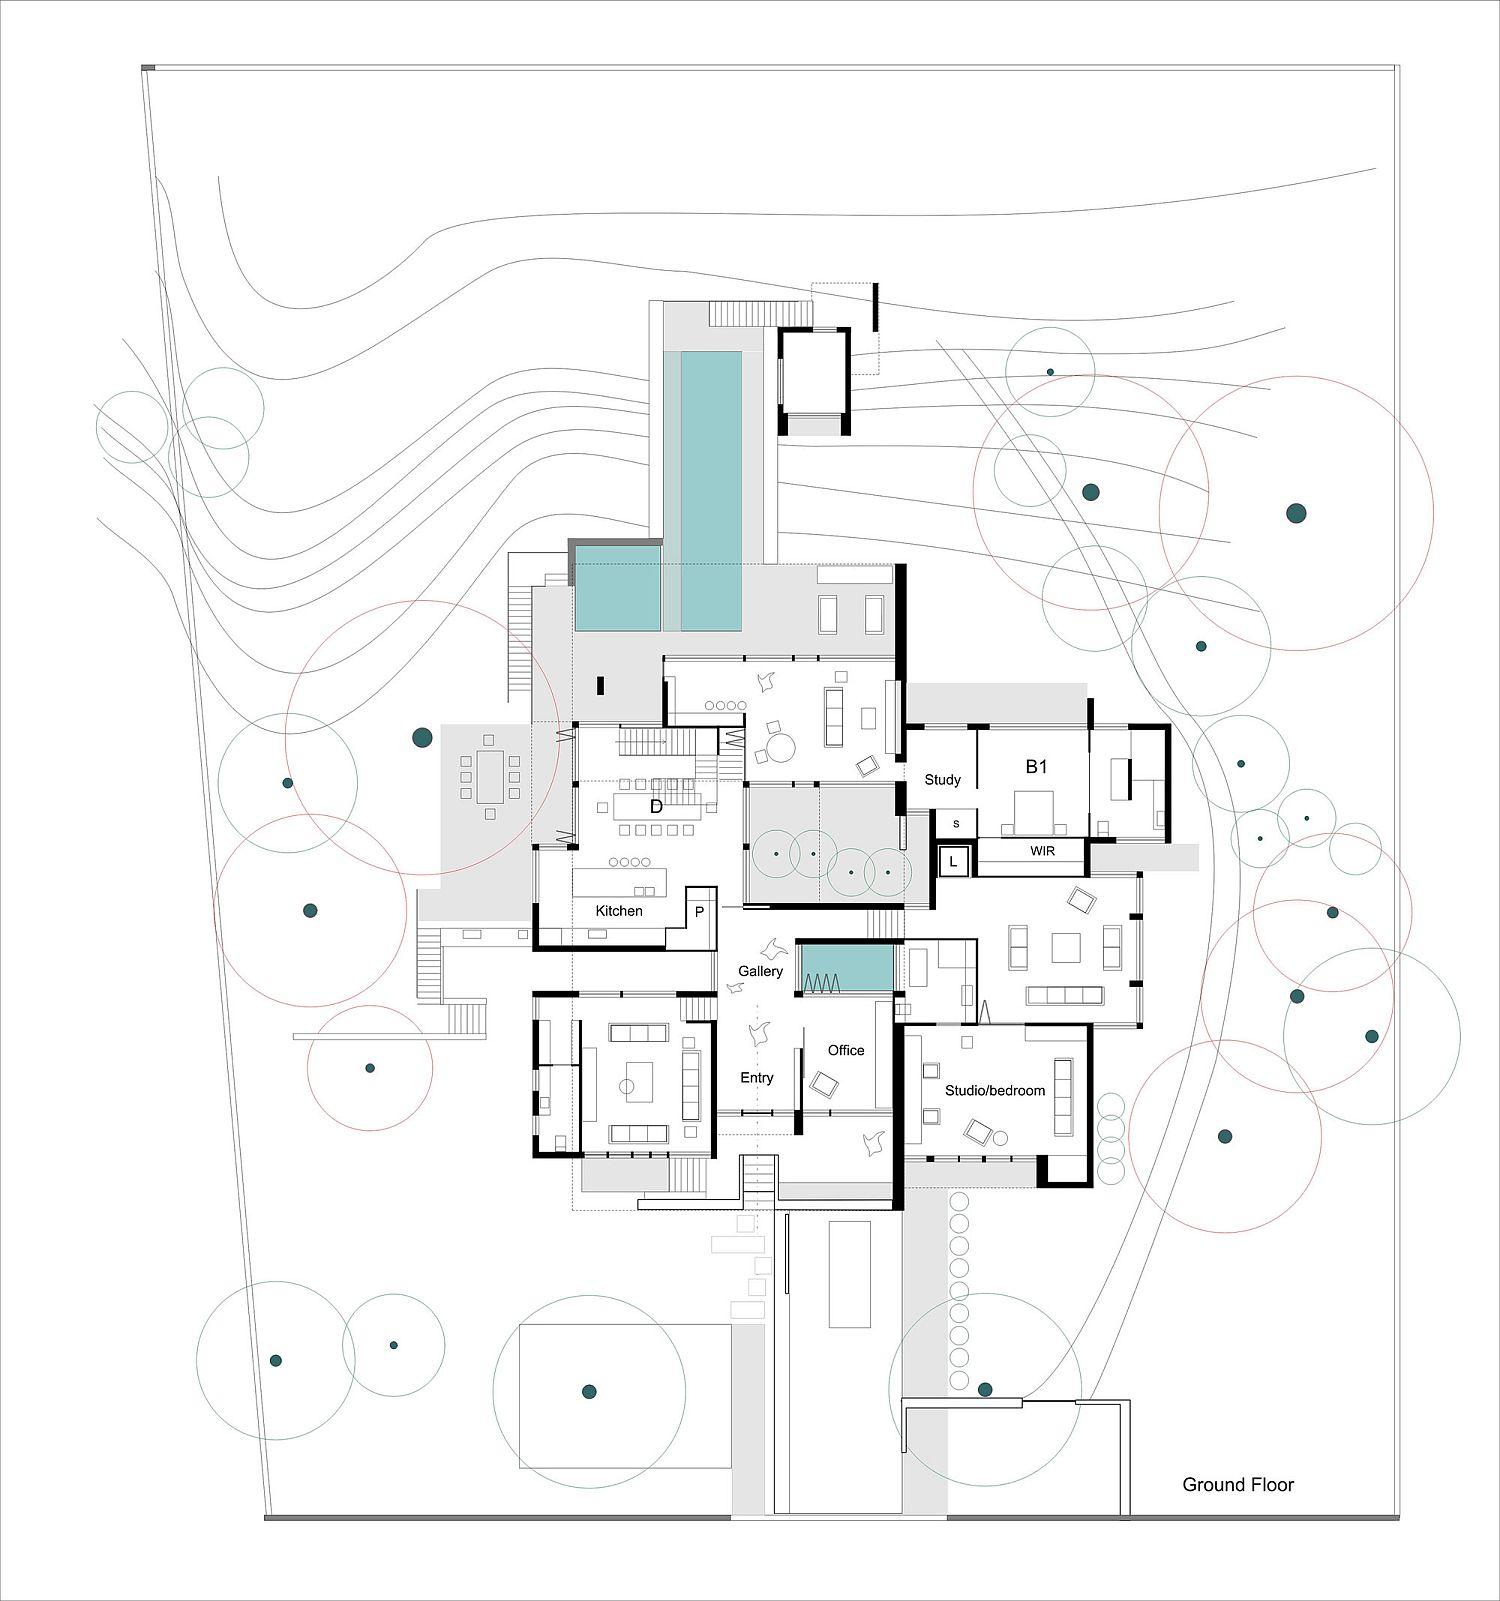 Ground floor plan of the modern home in Australia